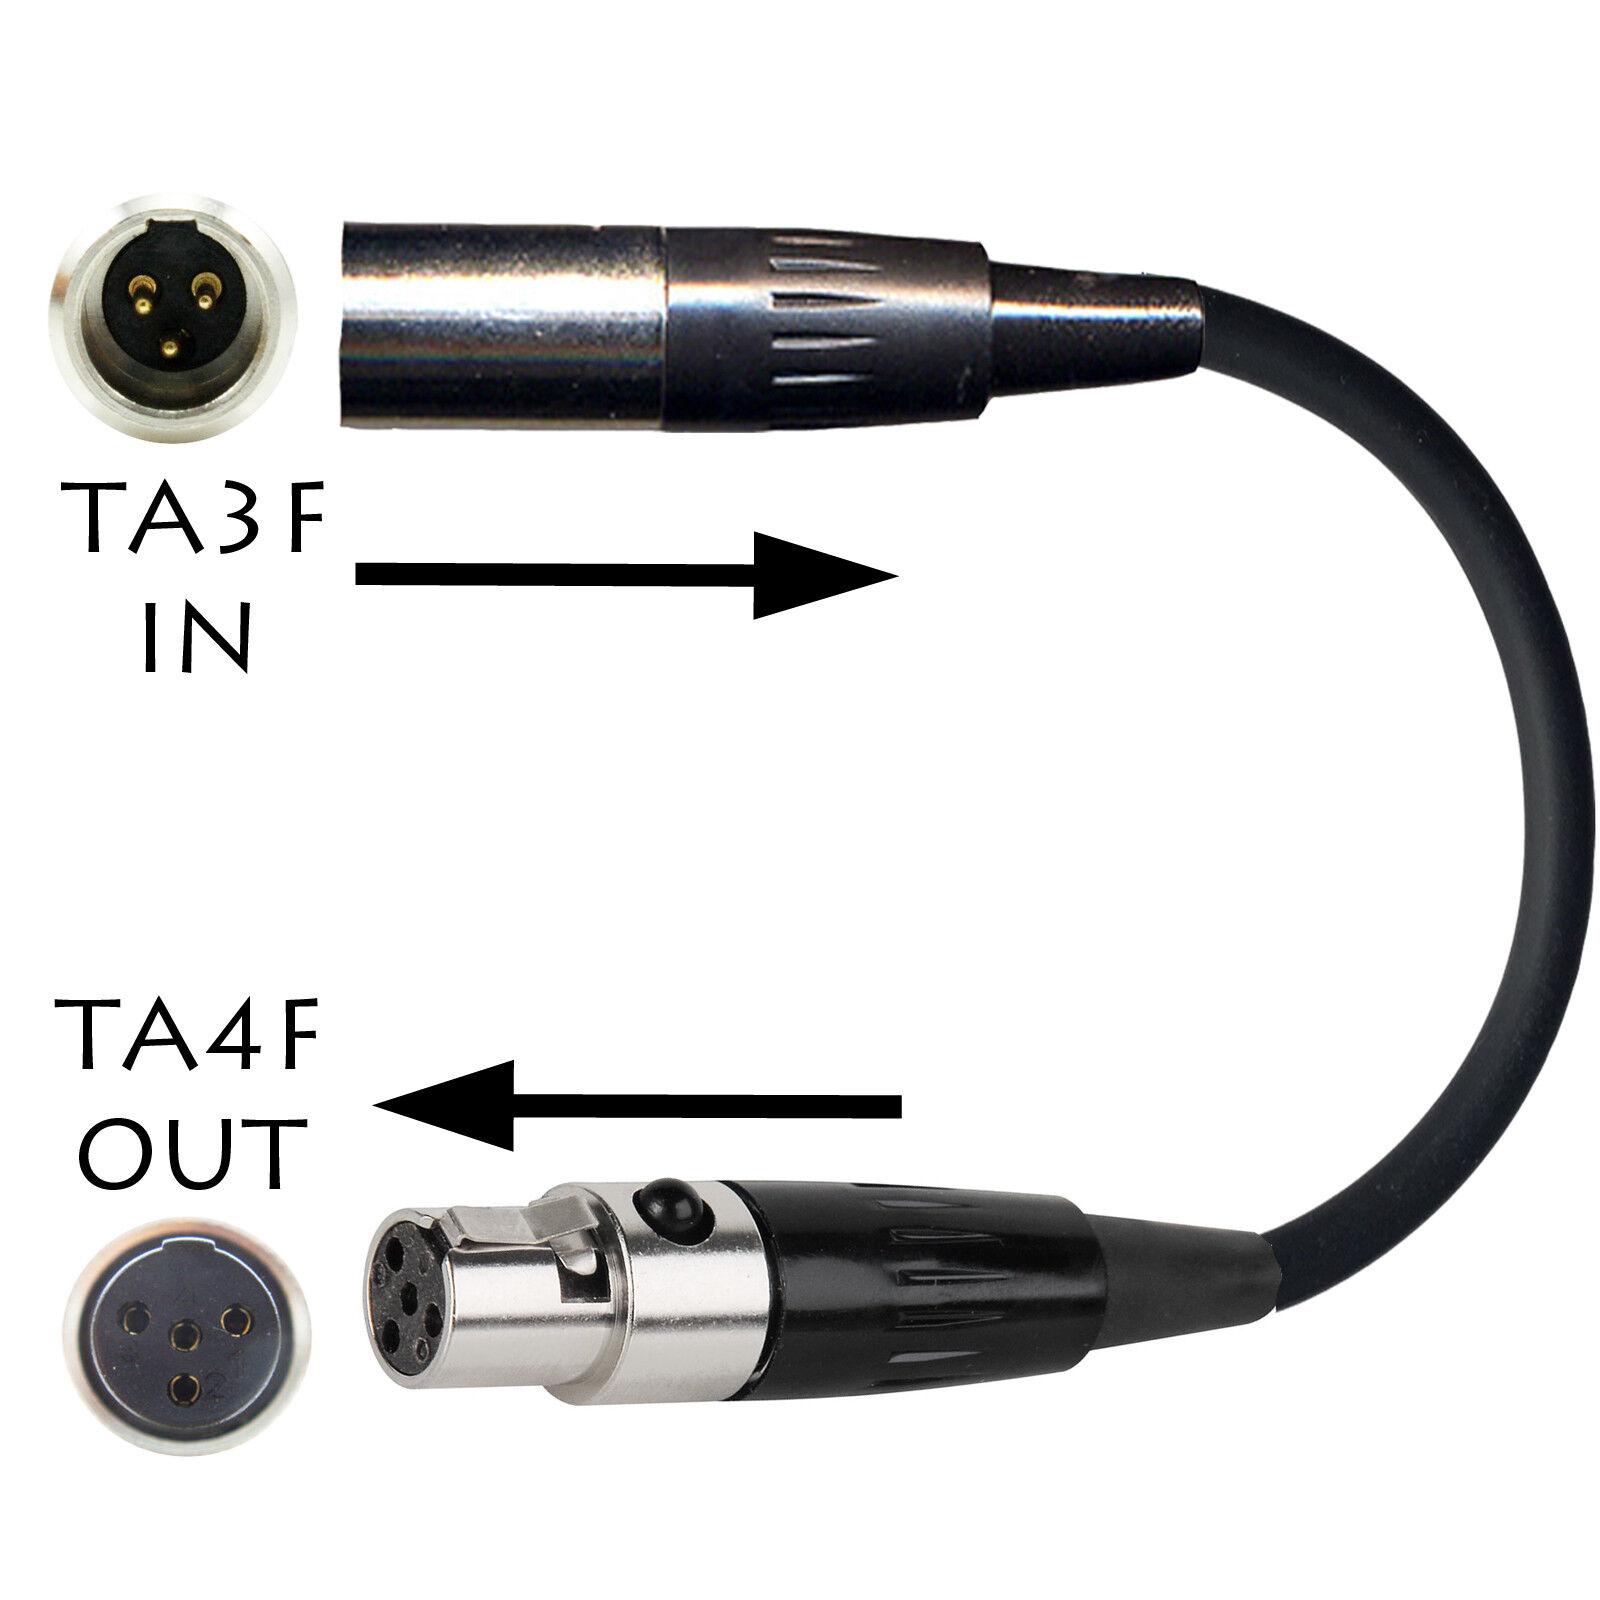 4 pin hirose female to mini xlr 3 pin audio adapter cable lead TA3f 10cm-10m XLR